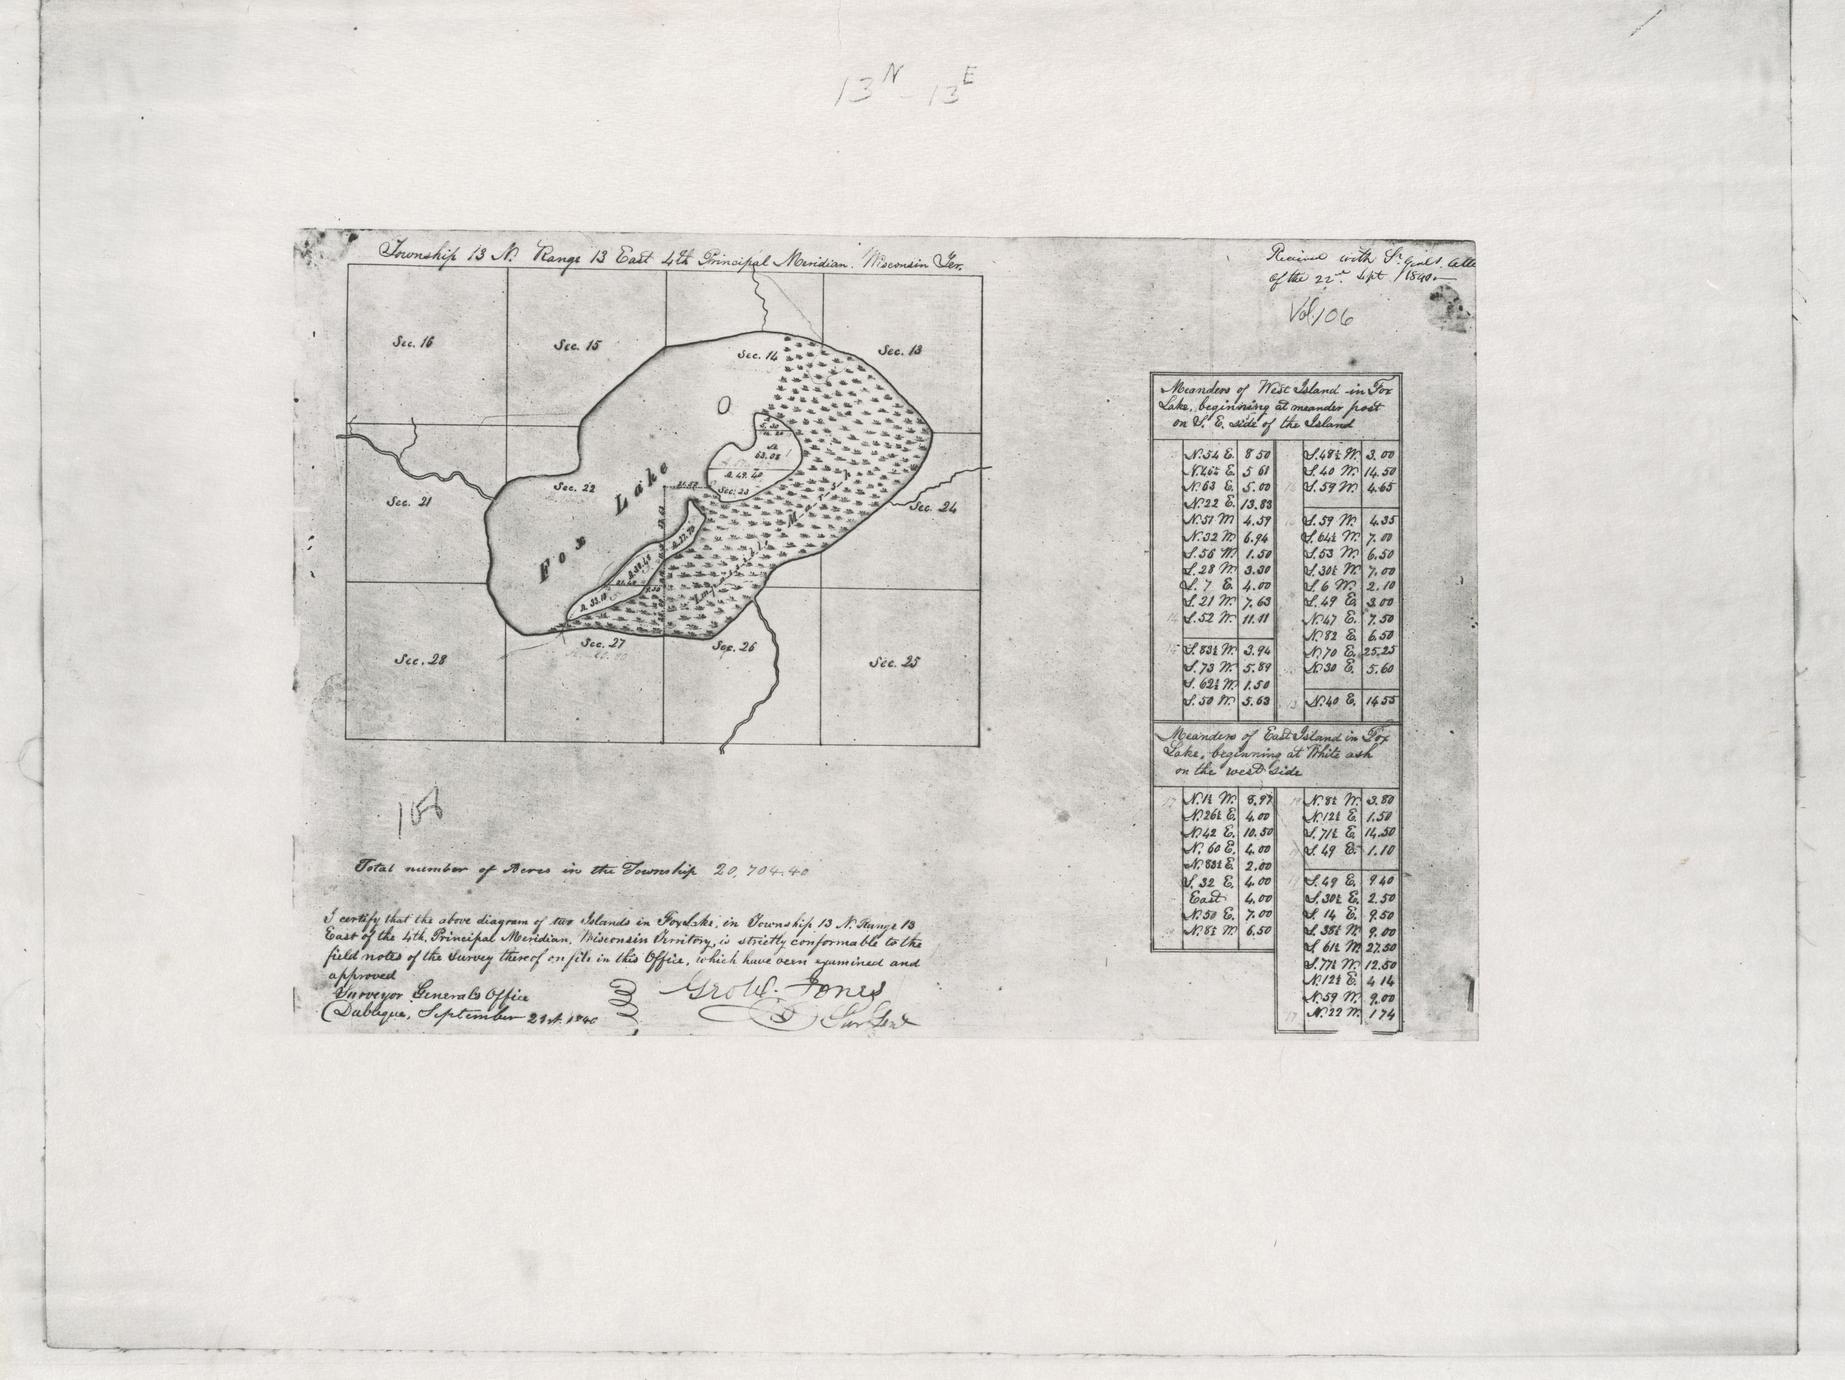 [Public Land Survey System map: Wisconsin Township 13 North, Range 13 East]